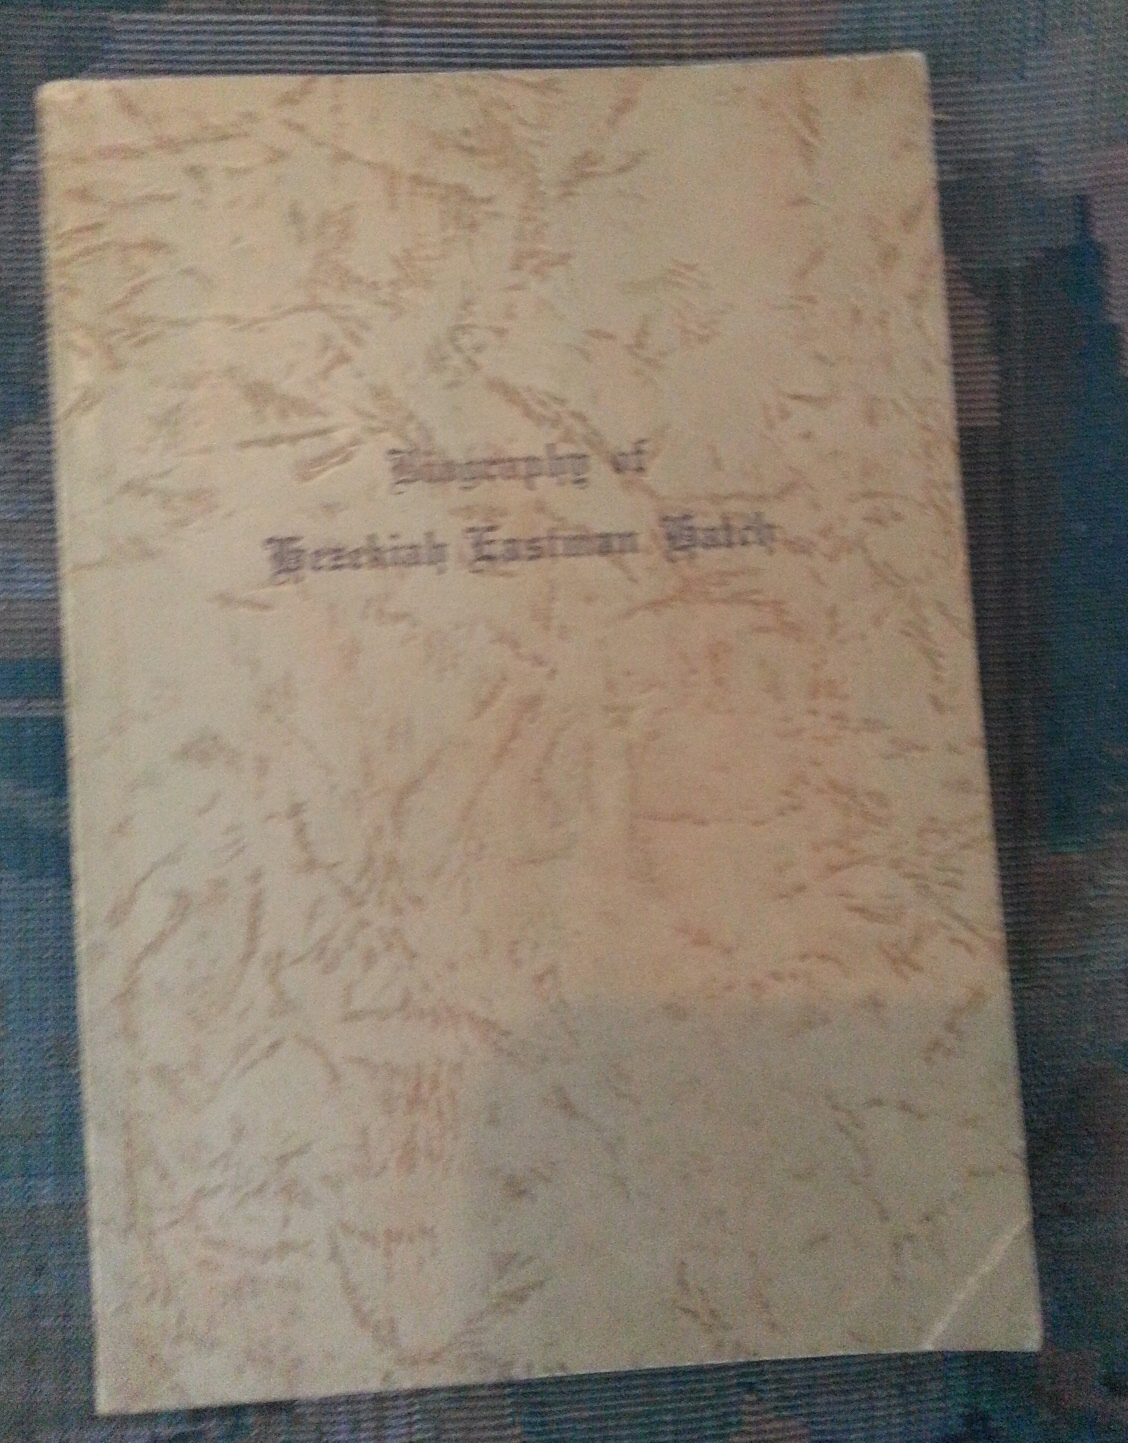 Image for Biography of Hezekiah Eastman Hatch